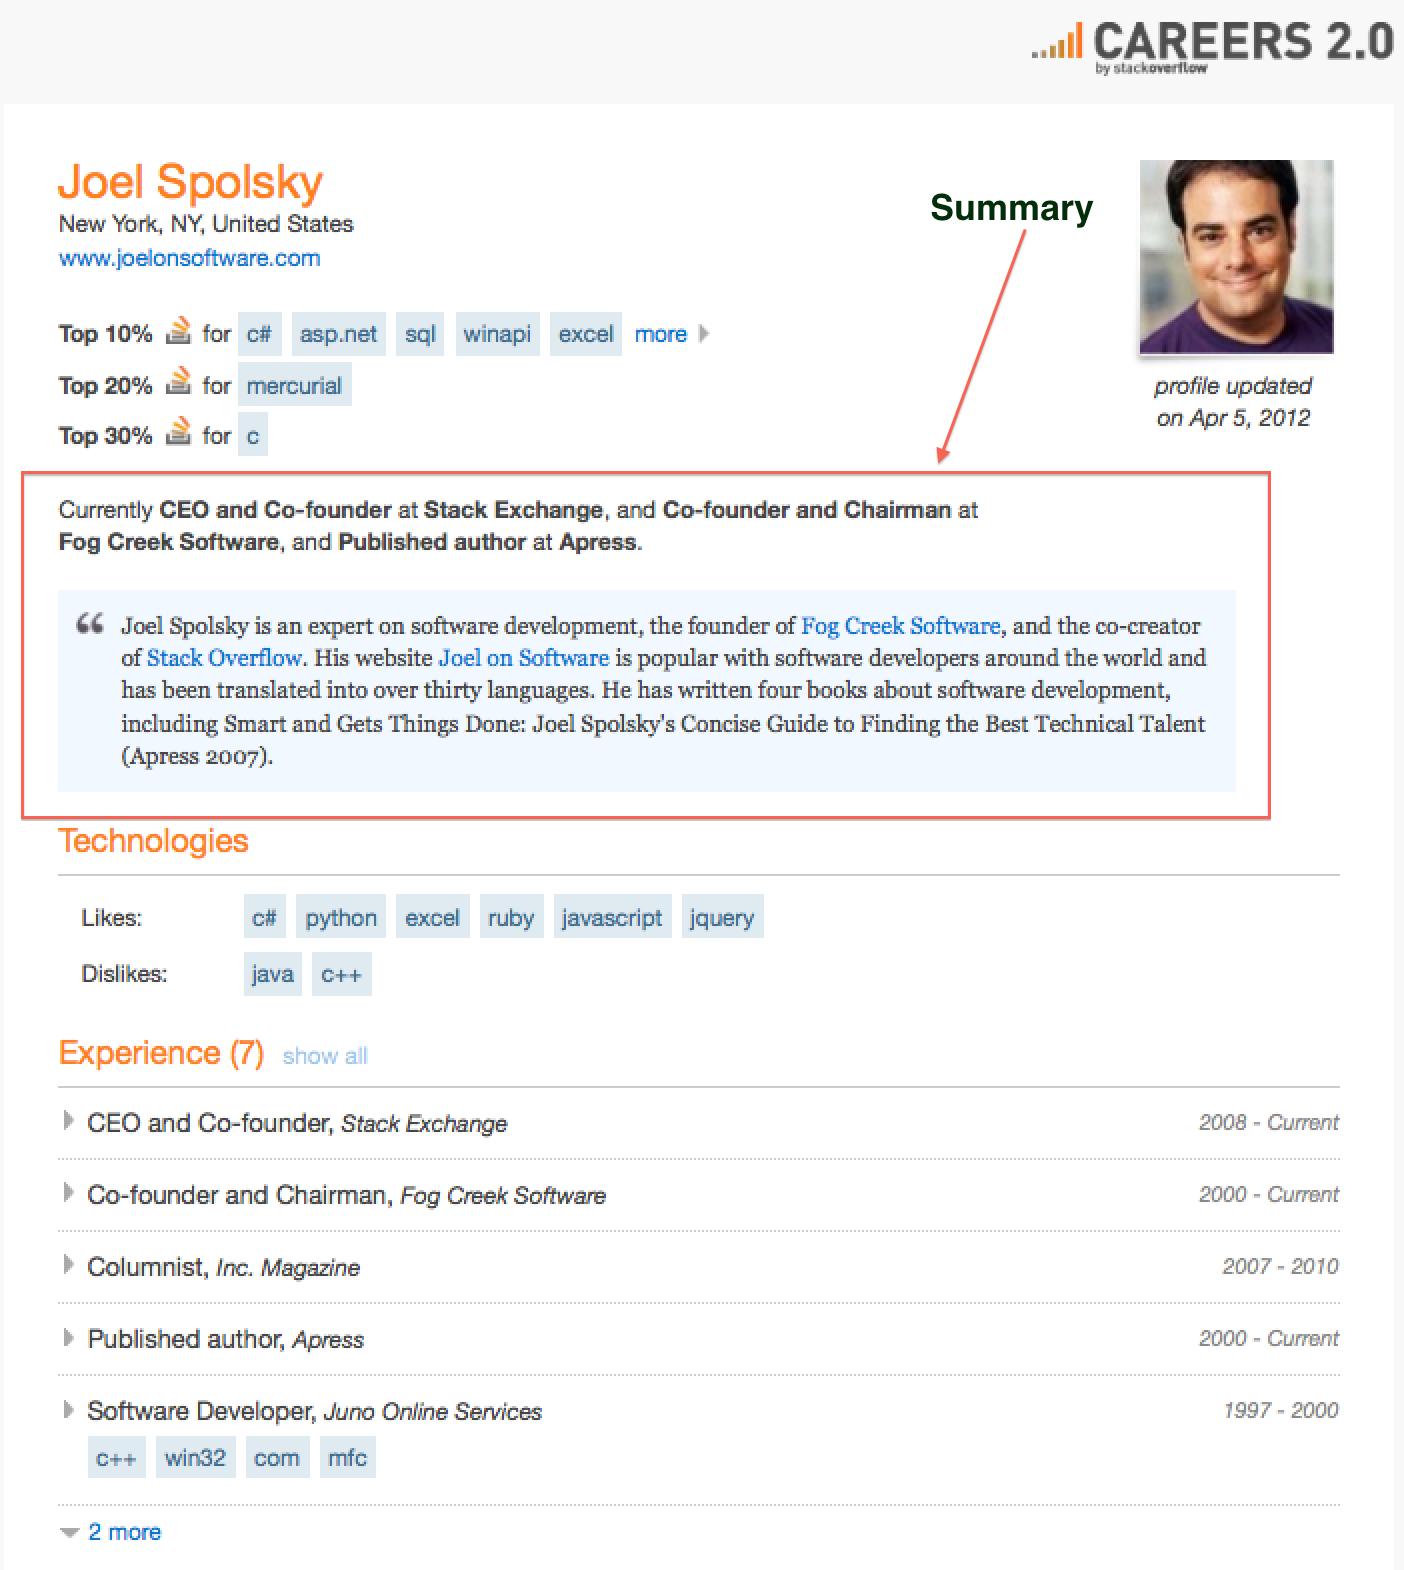 Resume Objective Examples   Http://www.resumecareer.info/resume